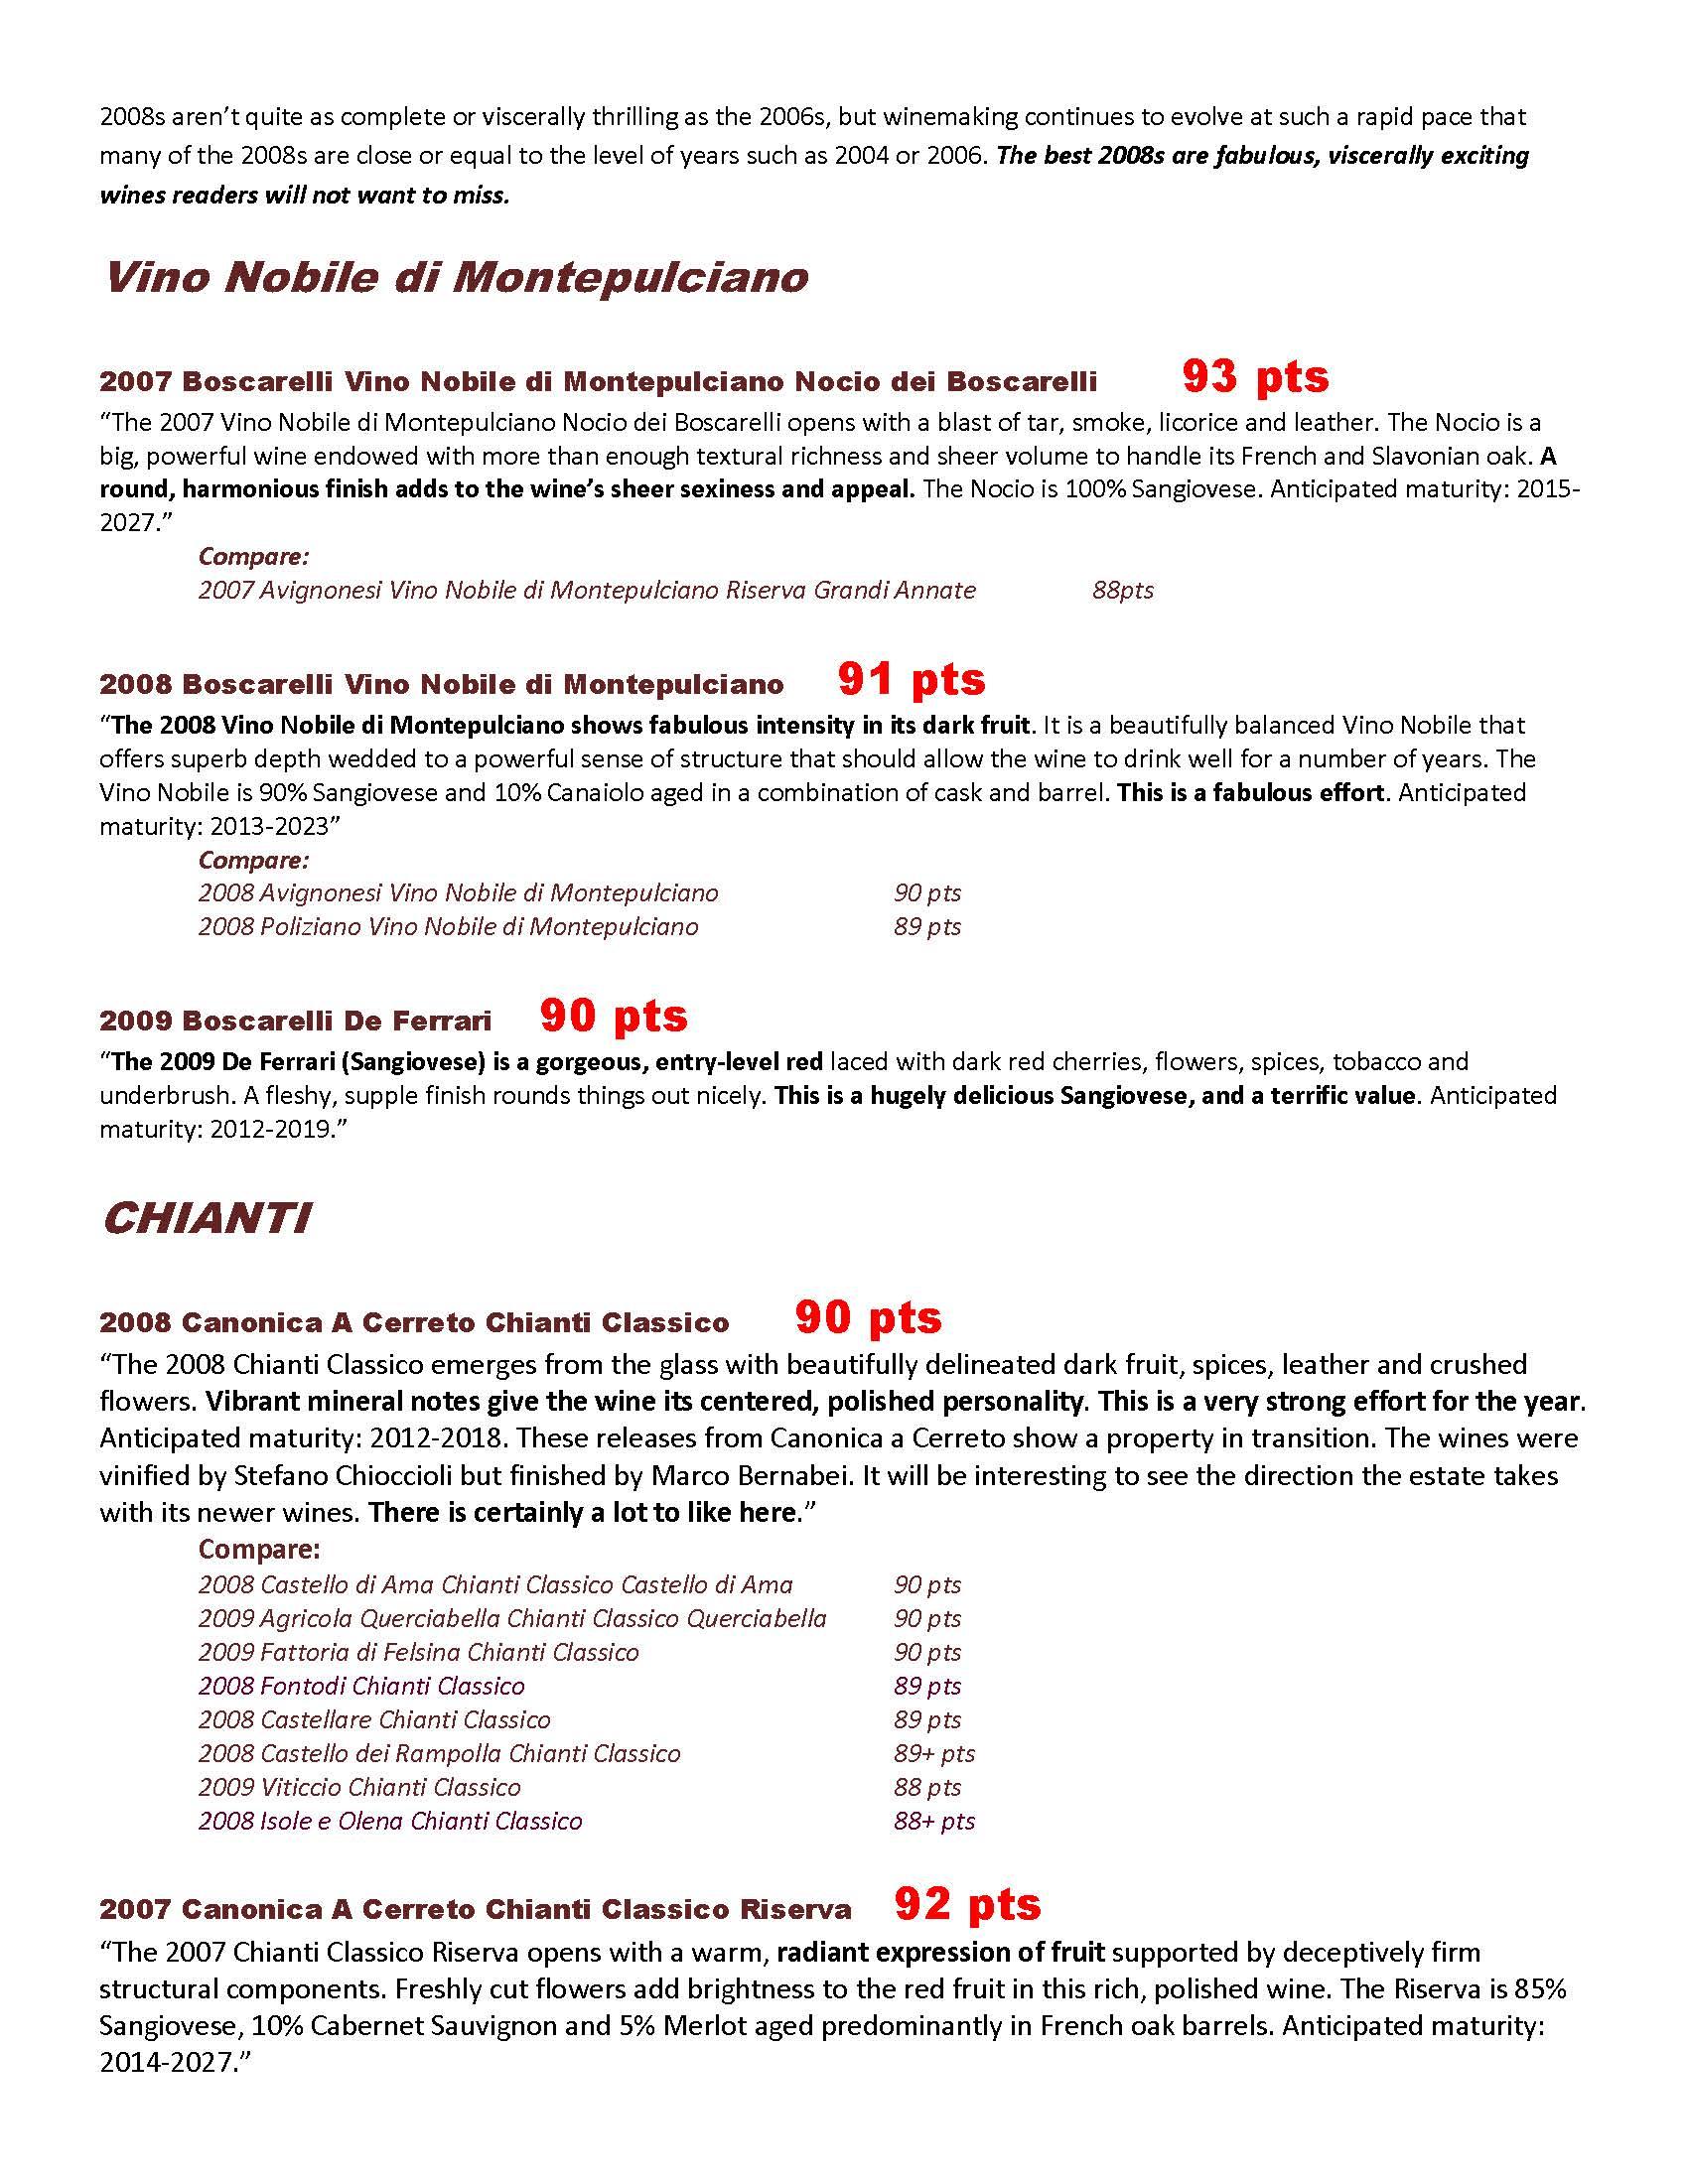 WA-Antonio-Galloni-Sep-2011-Focus-on-Tuscany-Article-Reviews_Pagina_2